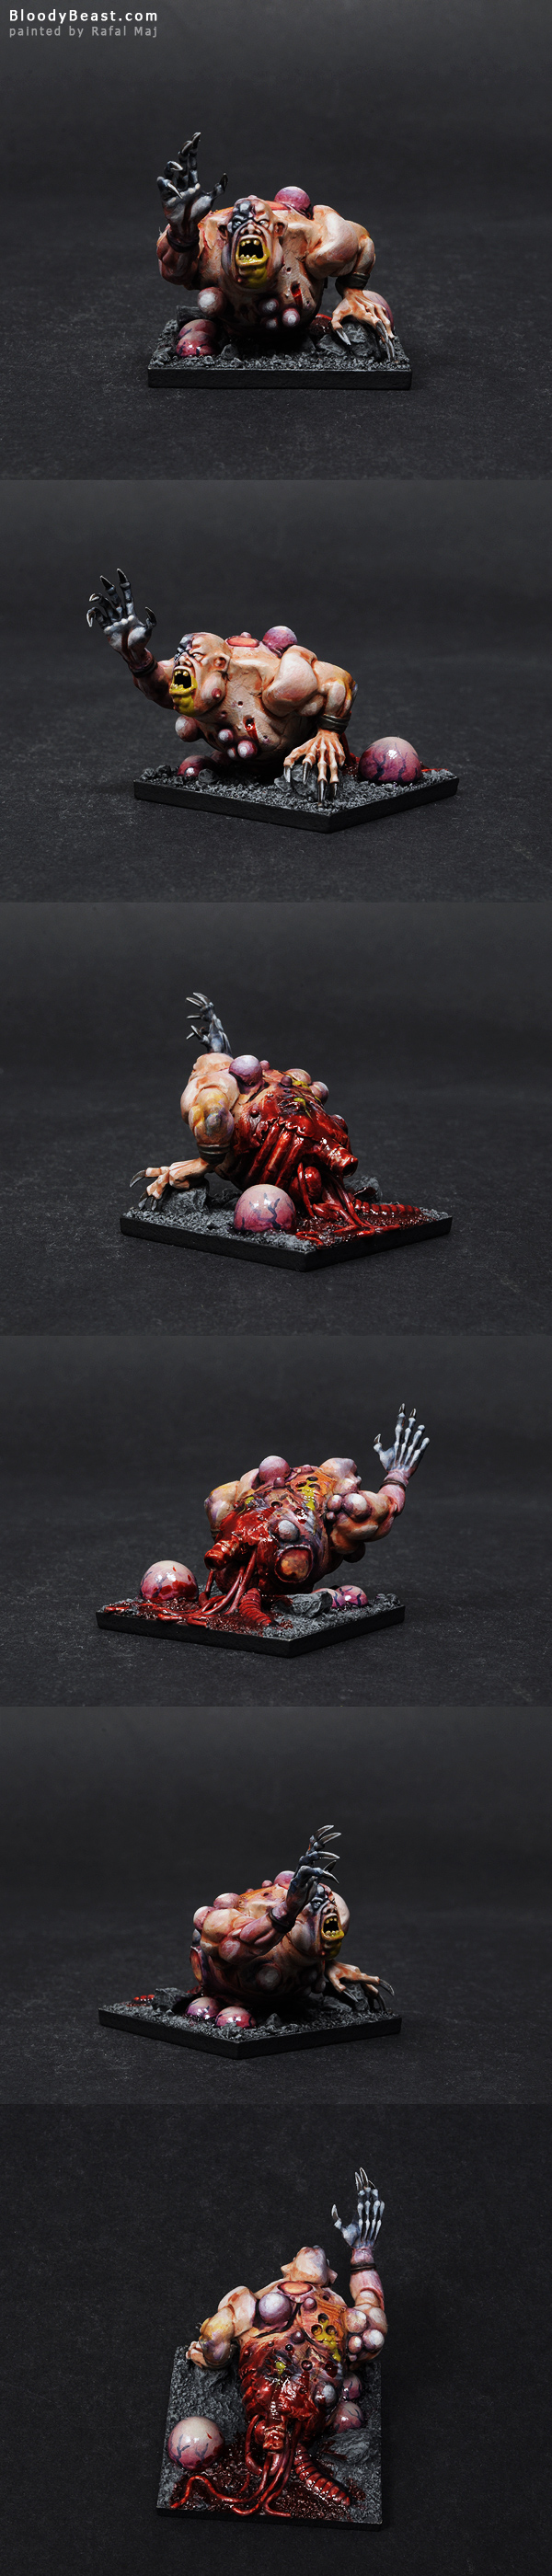 Nurgle Half Ogre painted by Rafal Maj (BloodyBeast.com)